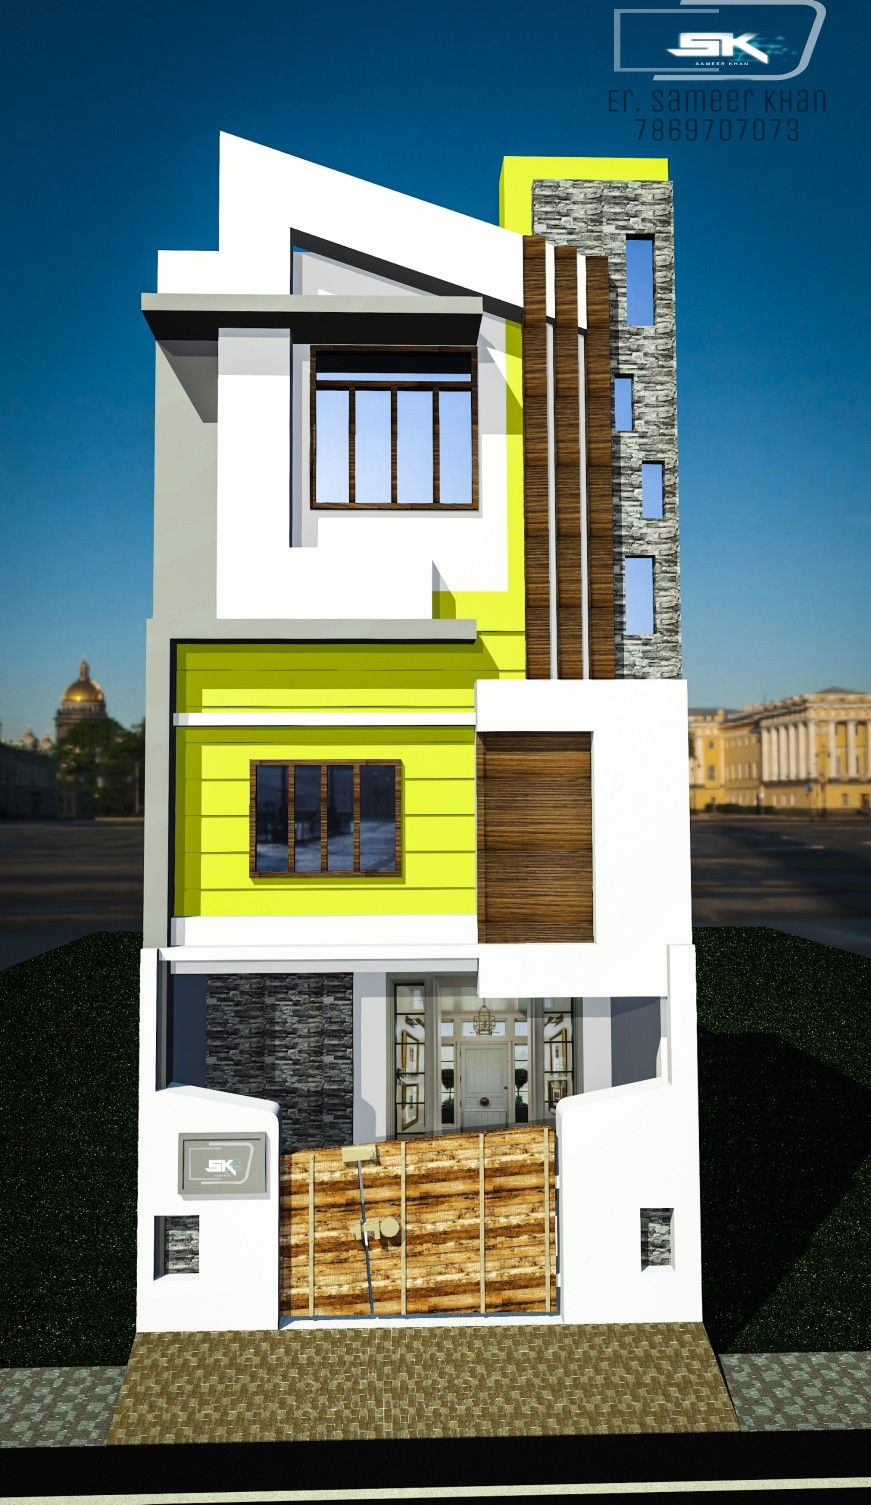 Small House Elevation Design Duplex House Design Latest House Designs: Introducing Indian Modern House Exterior Elevation By Er Sameer Khan